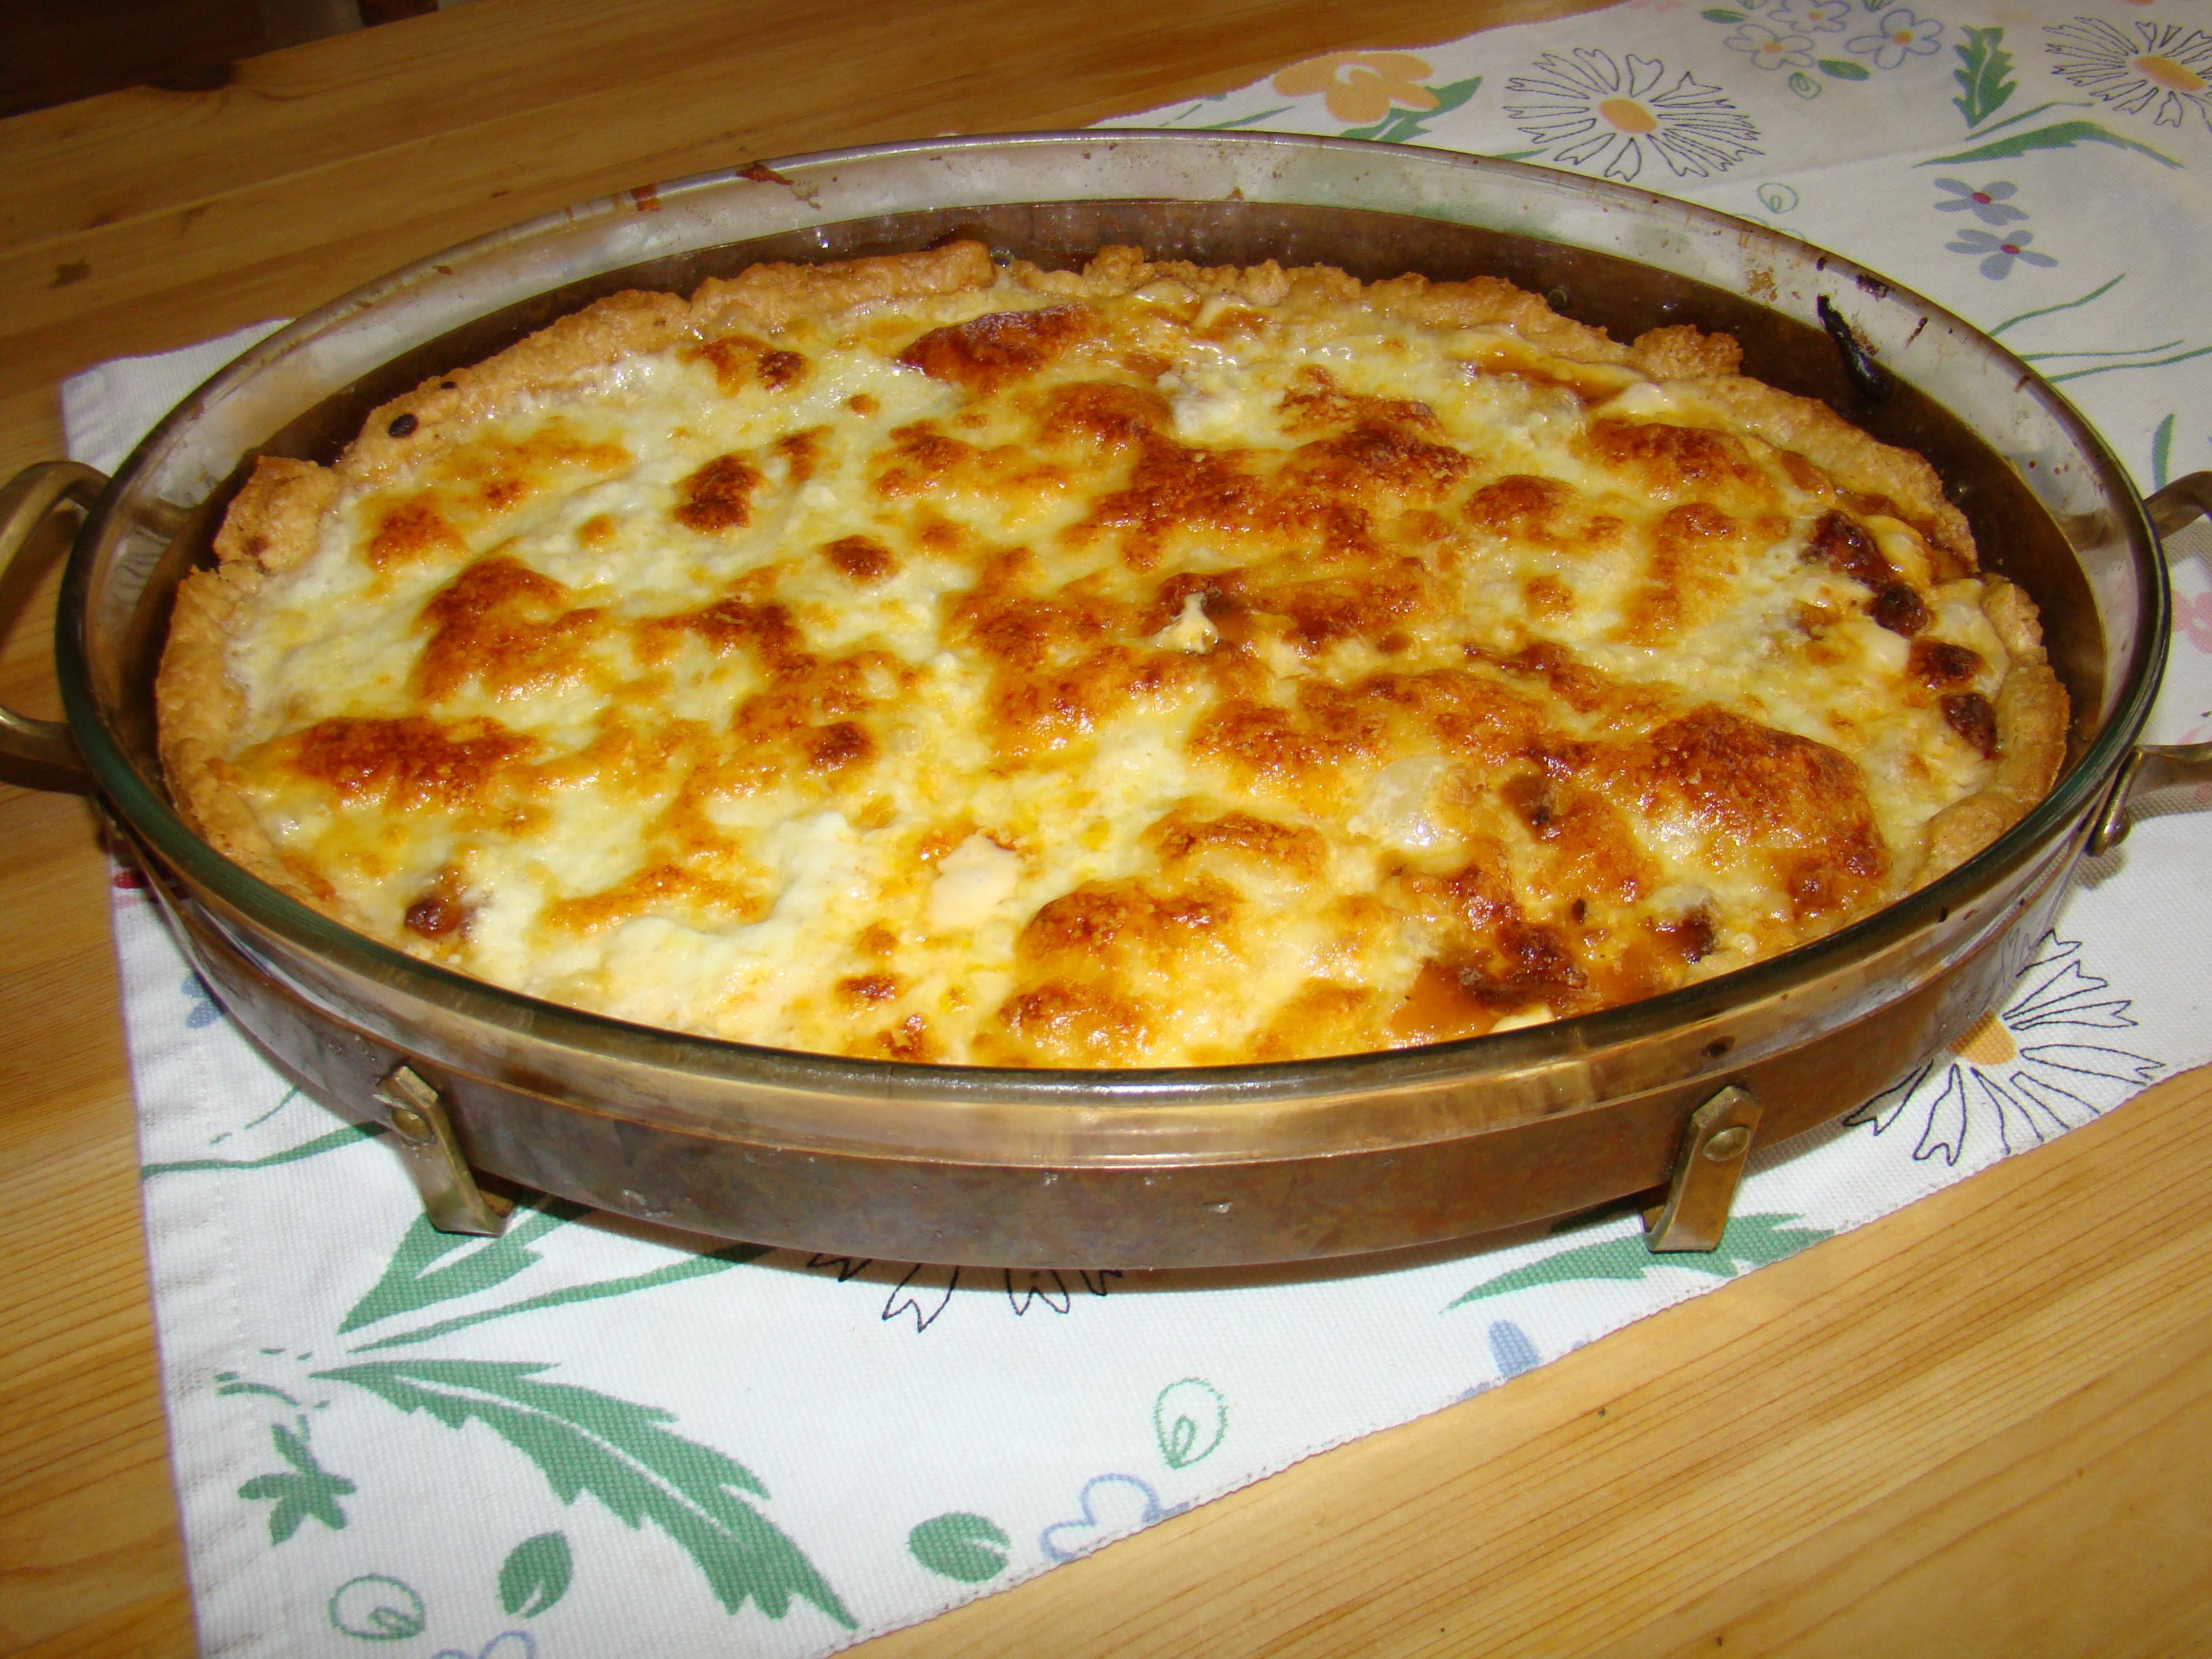 kycklingfilé i ugn med mozzarella